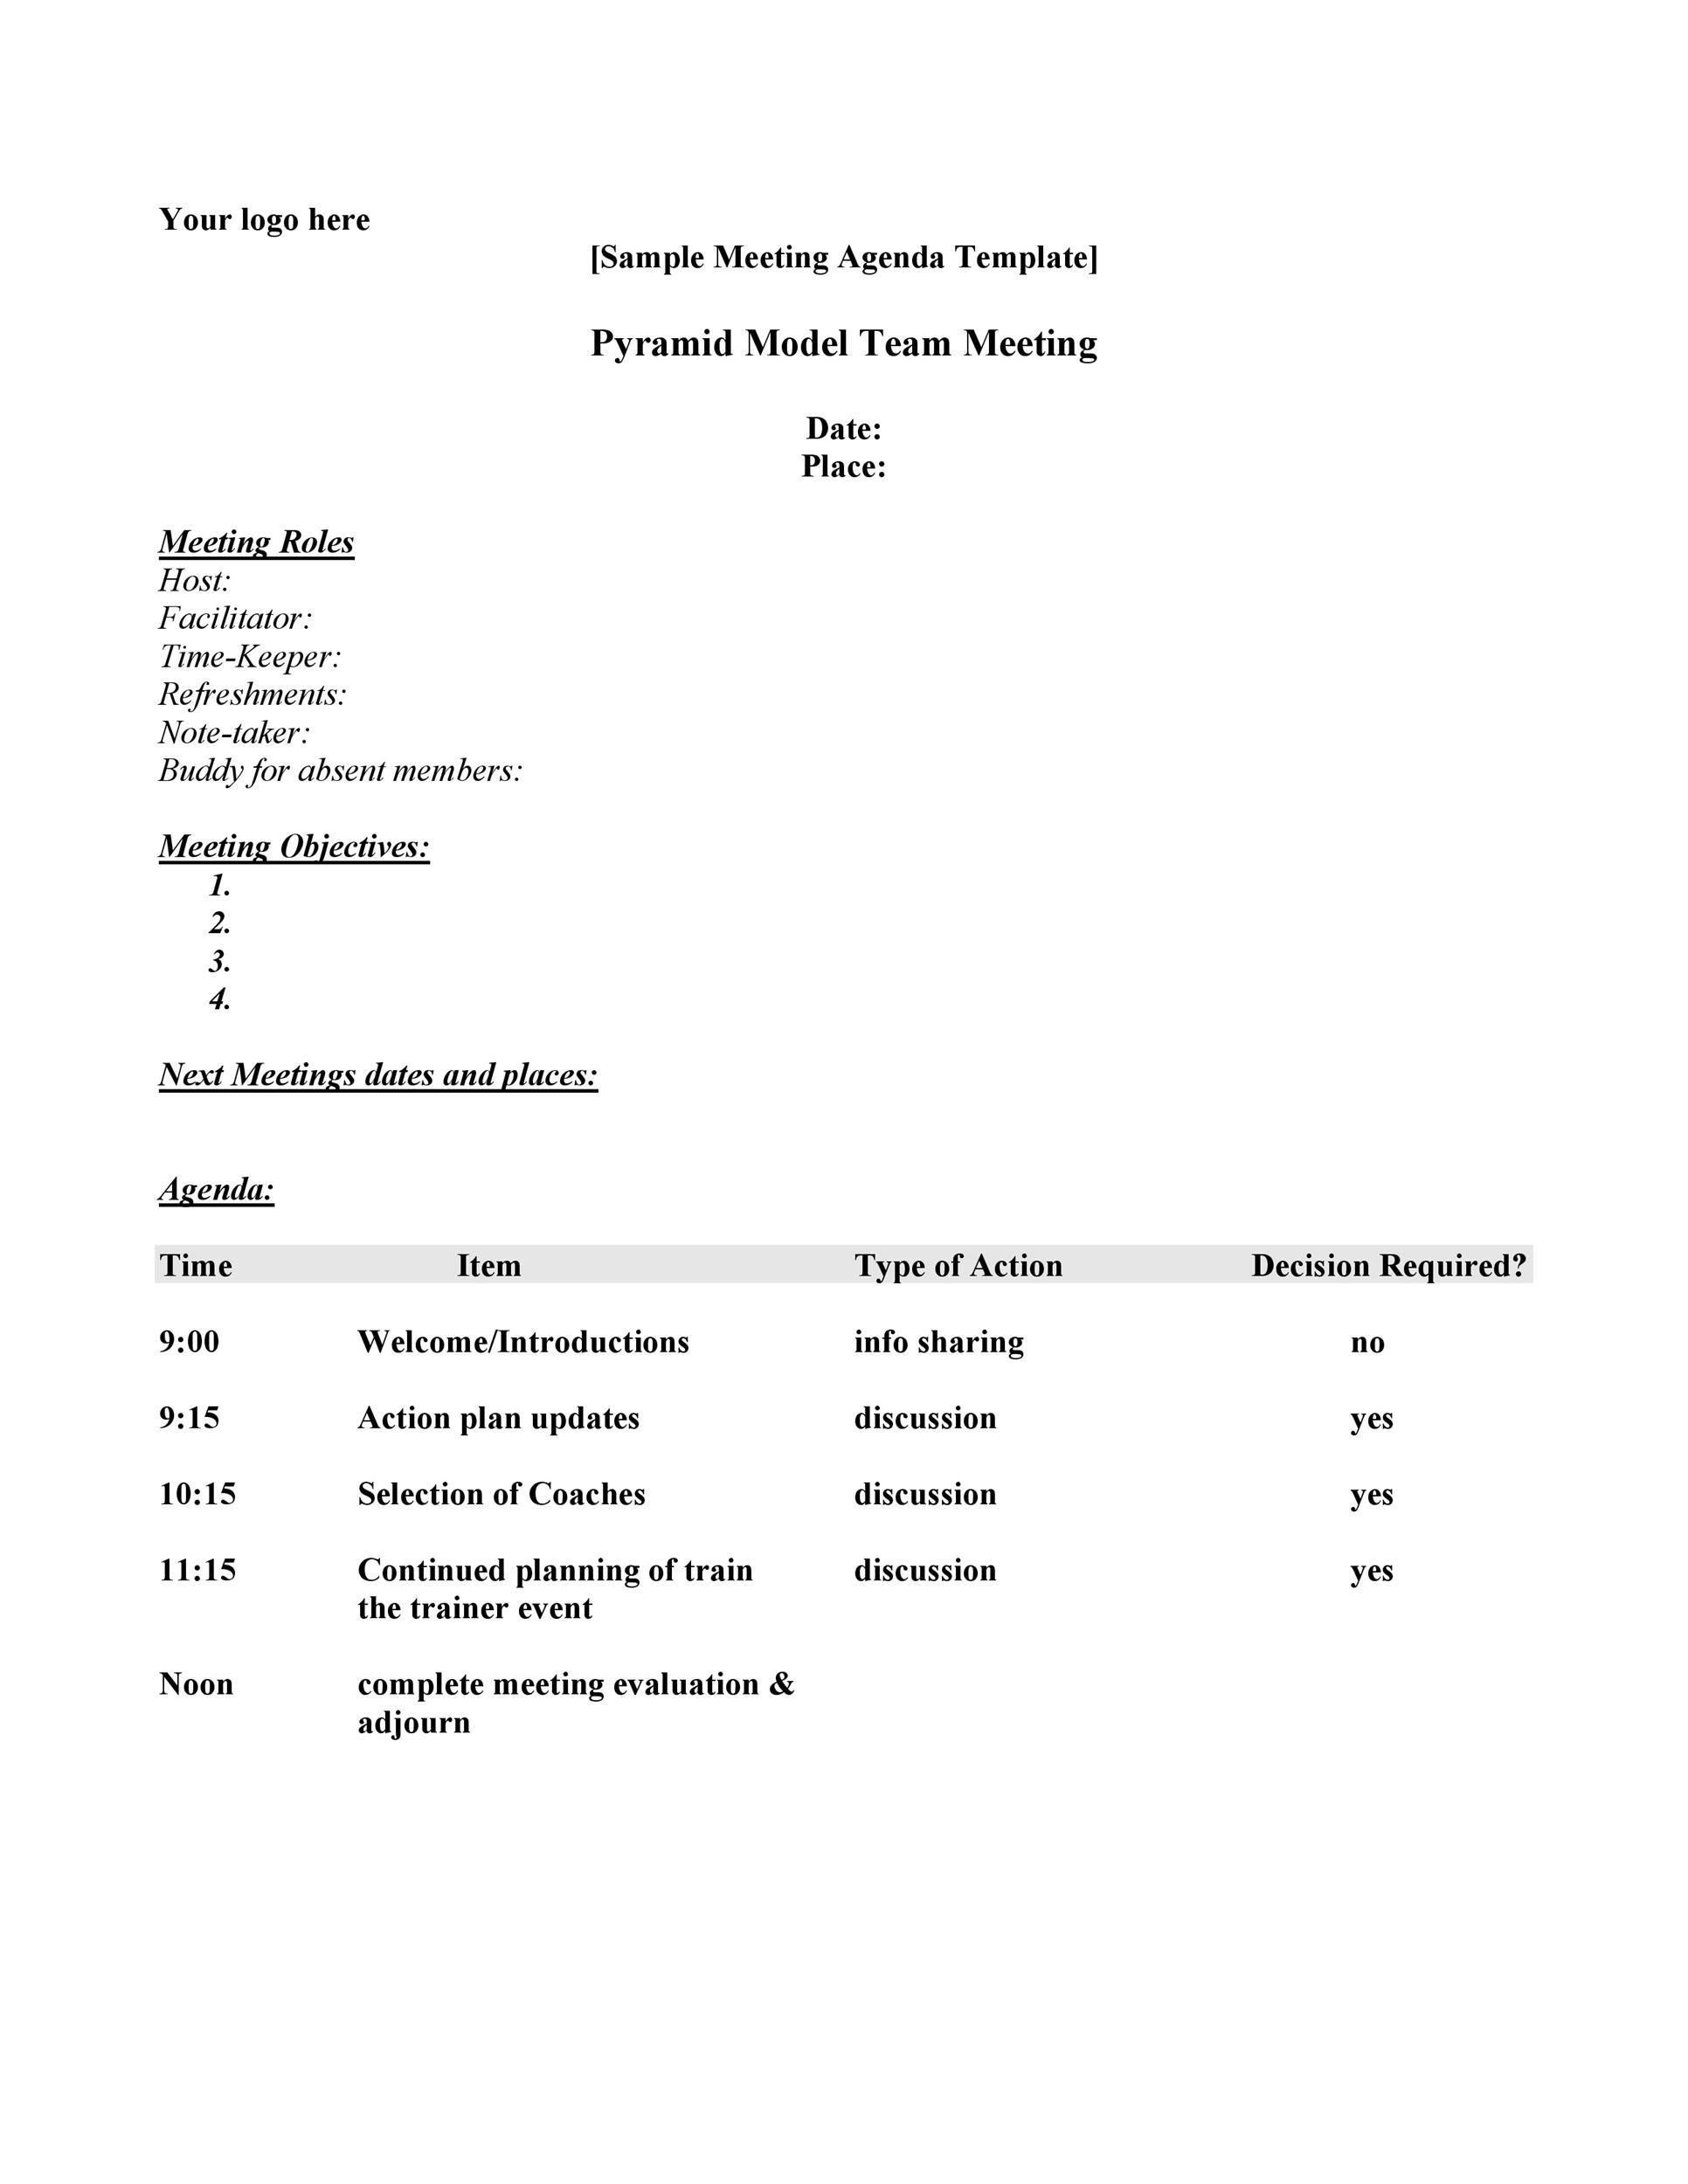 005 Fascinating Staff Meeting Agenda Template Photo  Example Pdf Sample FormatFull